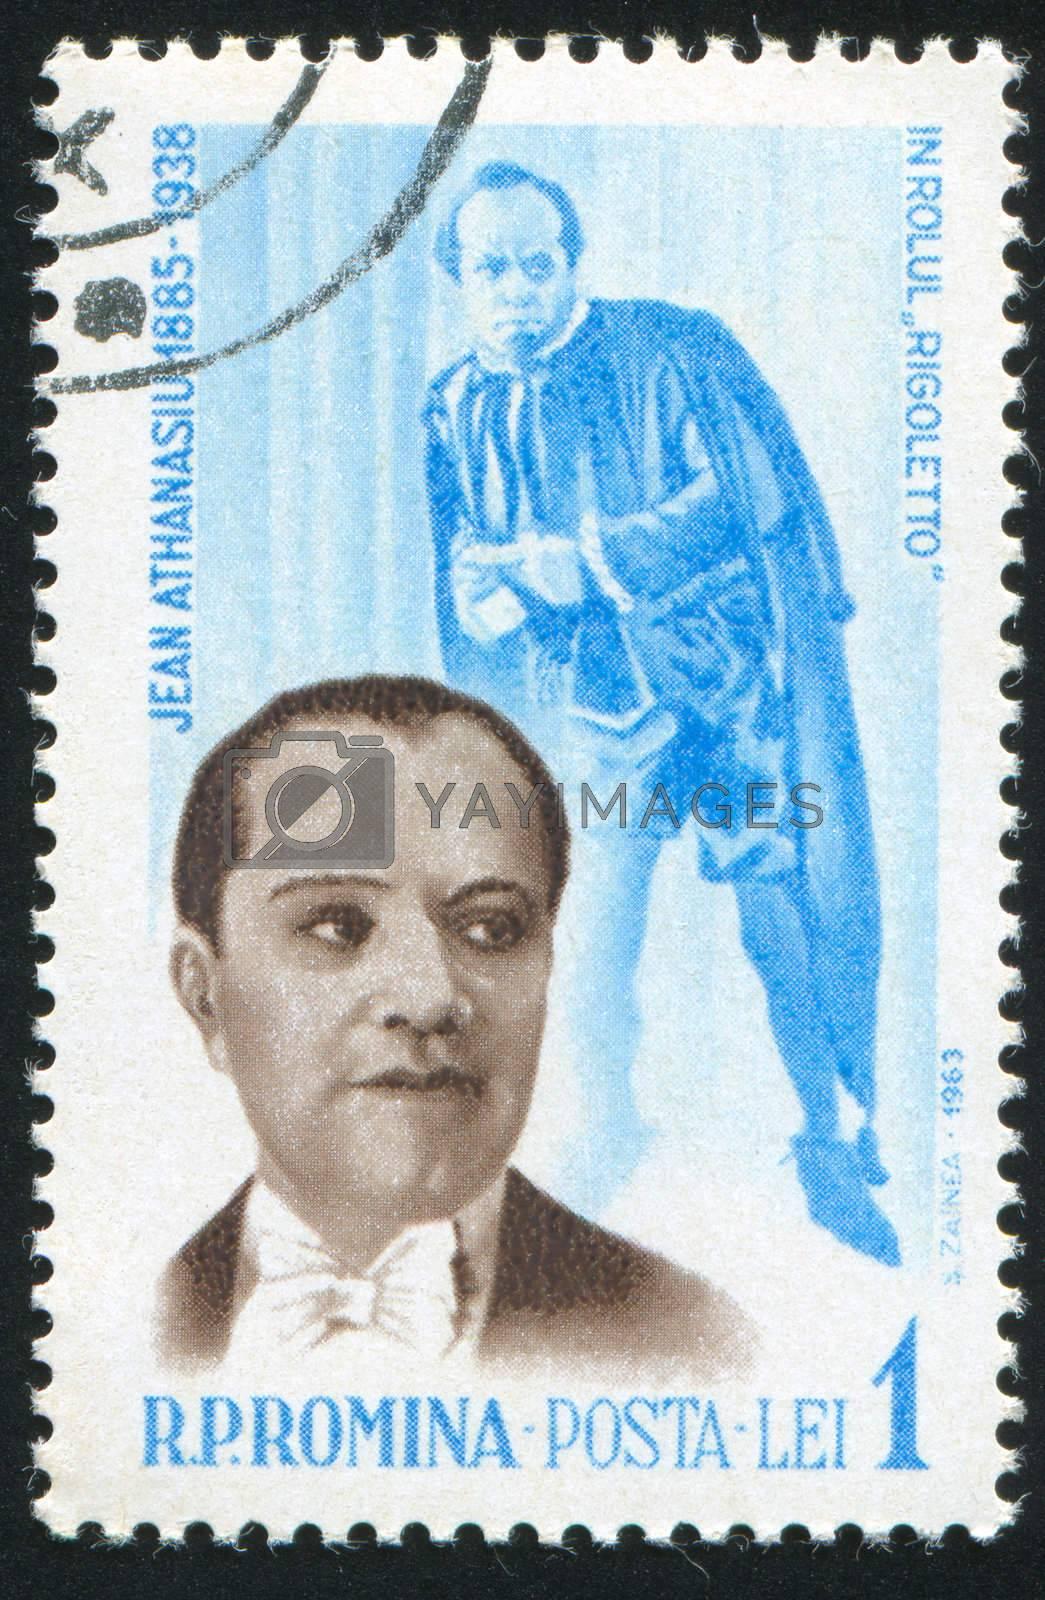 ROMANIA - CIRCA 1963: stamp printed by Romania, show Jean Athanasiu as Rigoletto, circa 1963.